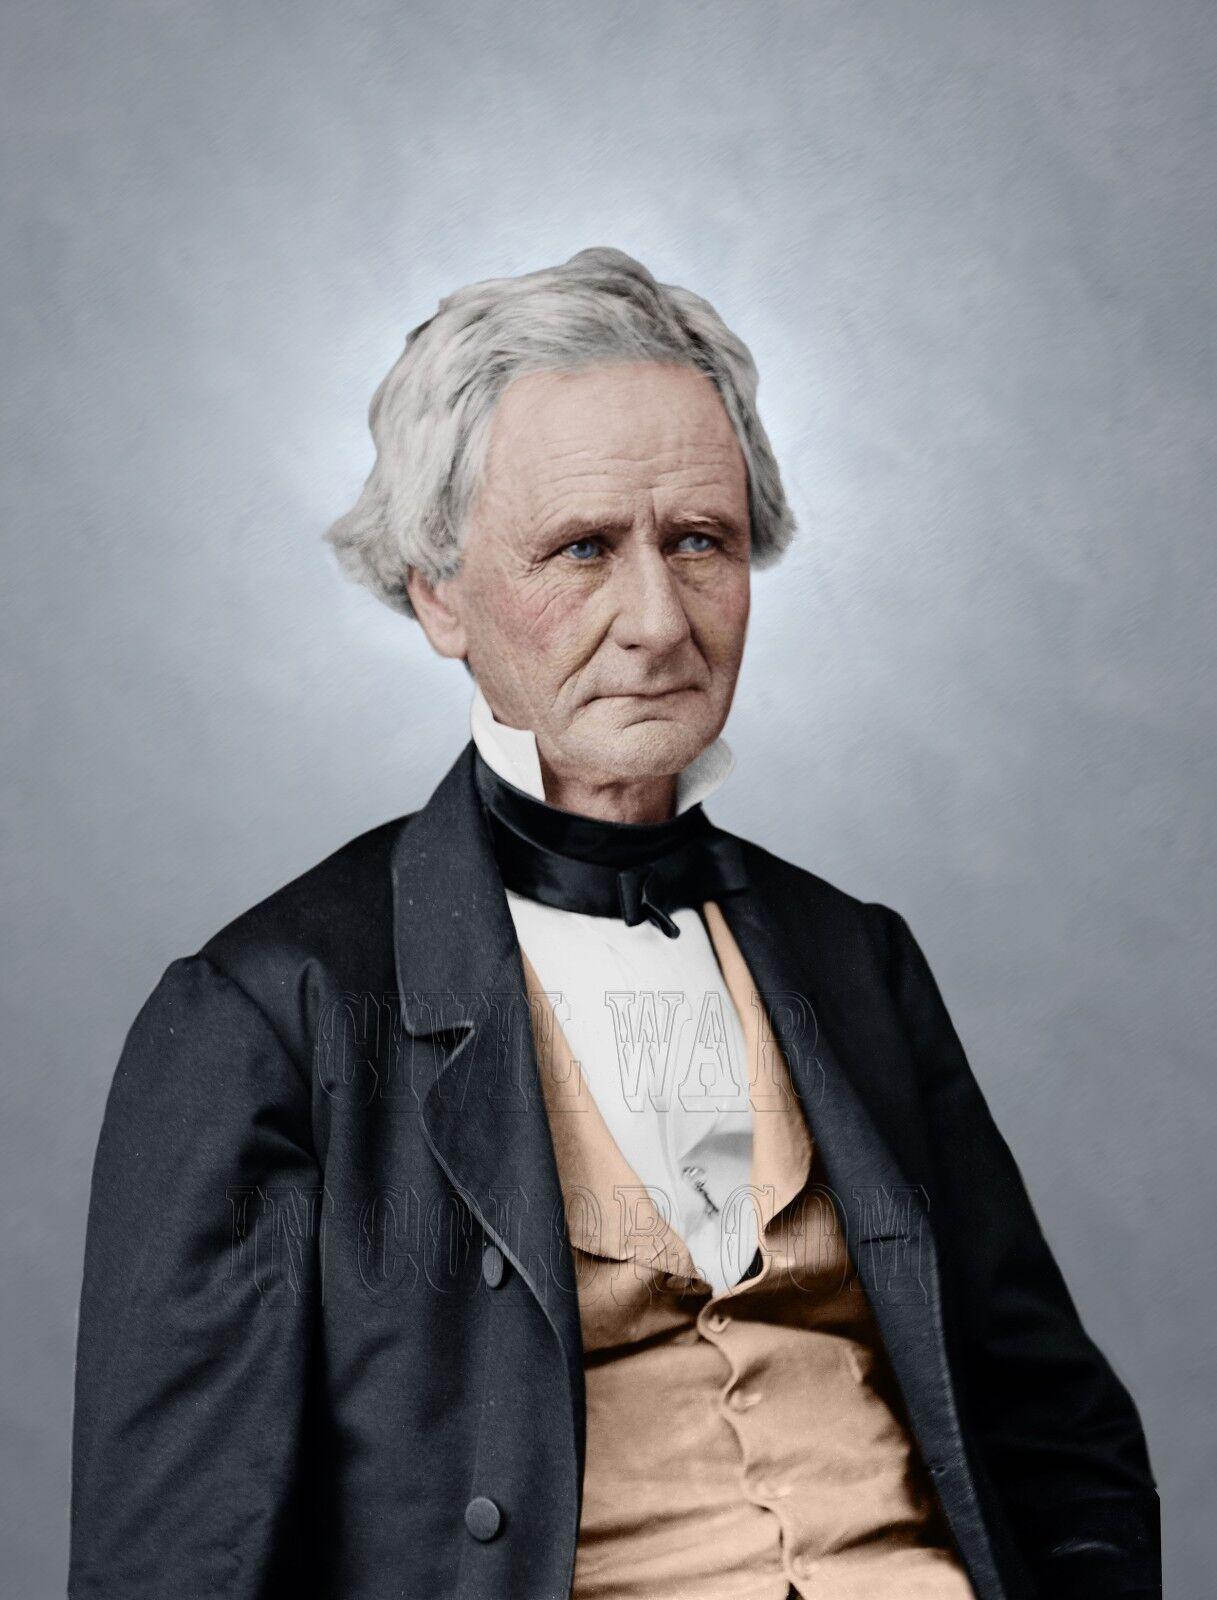 Simon Cameron Secretary War Lincoln Cabinet Farbe Tinted photo Civil War 05309